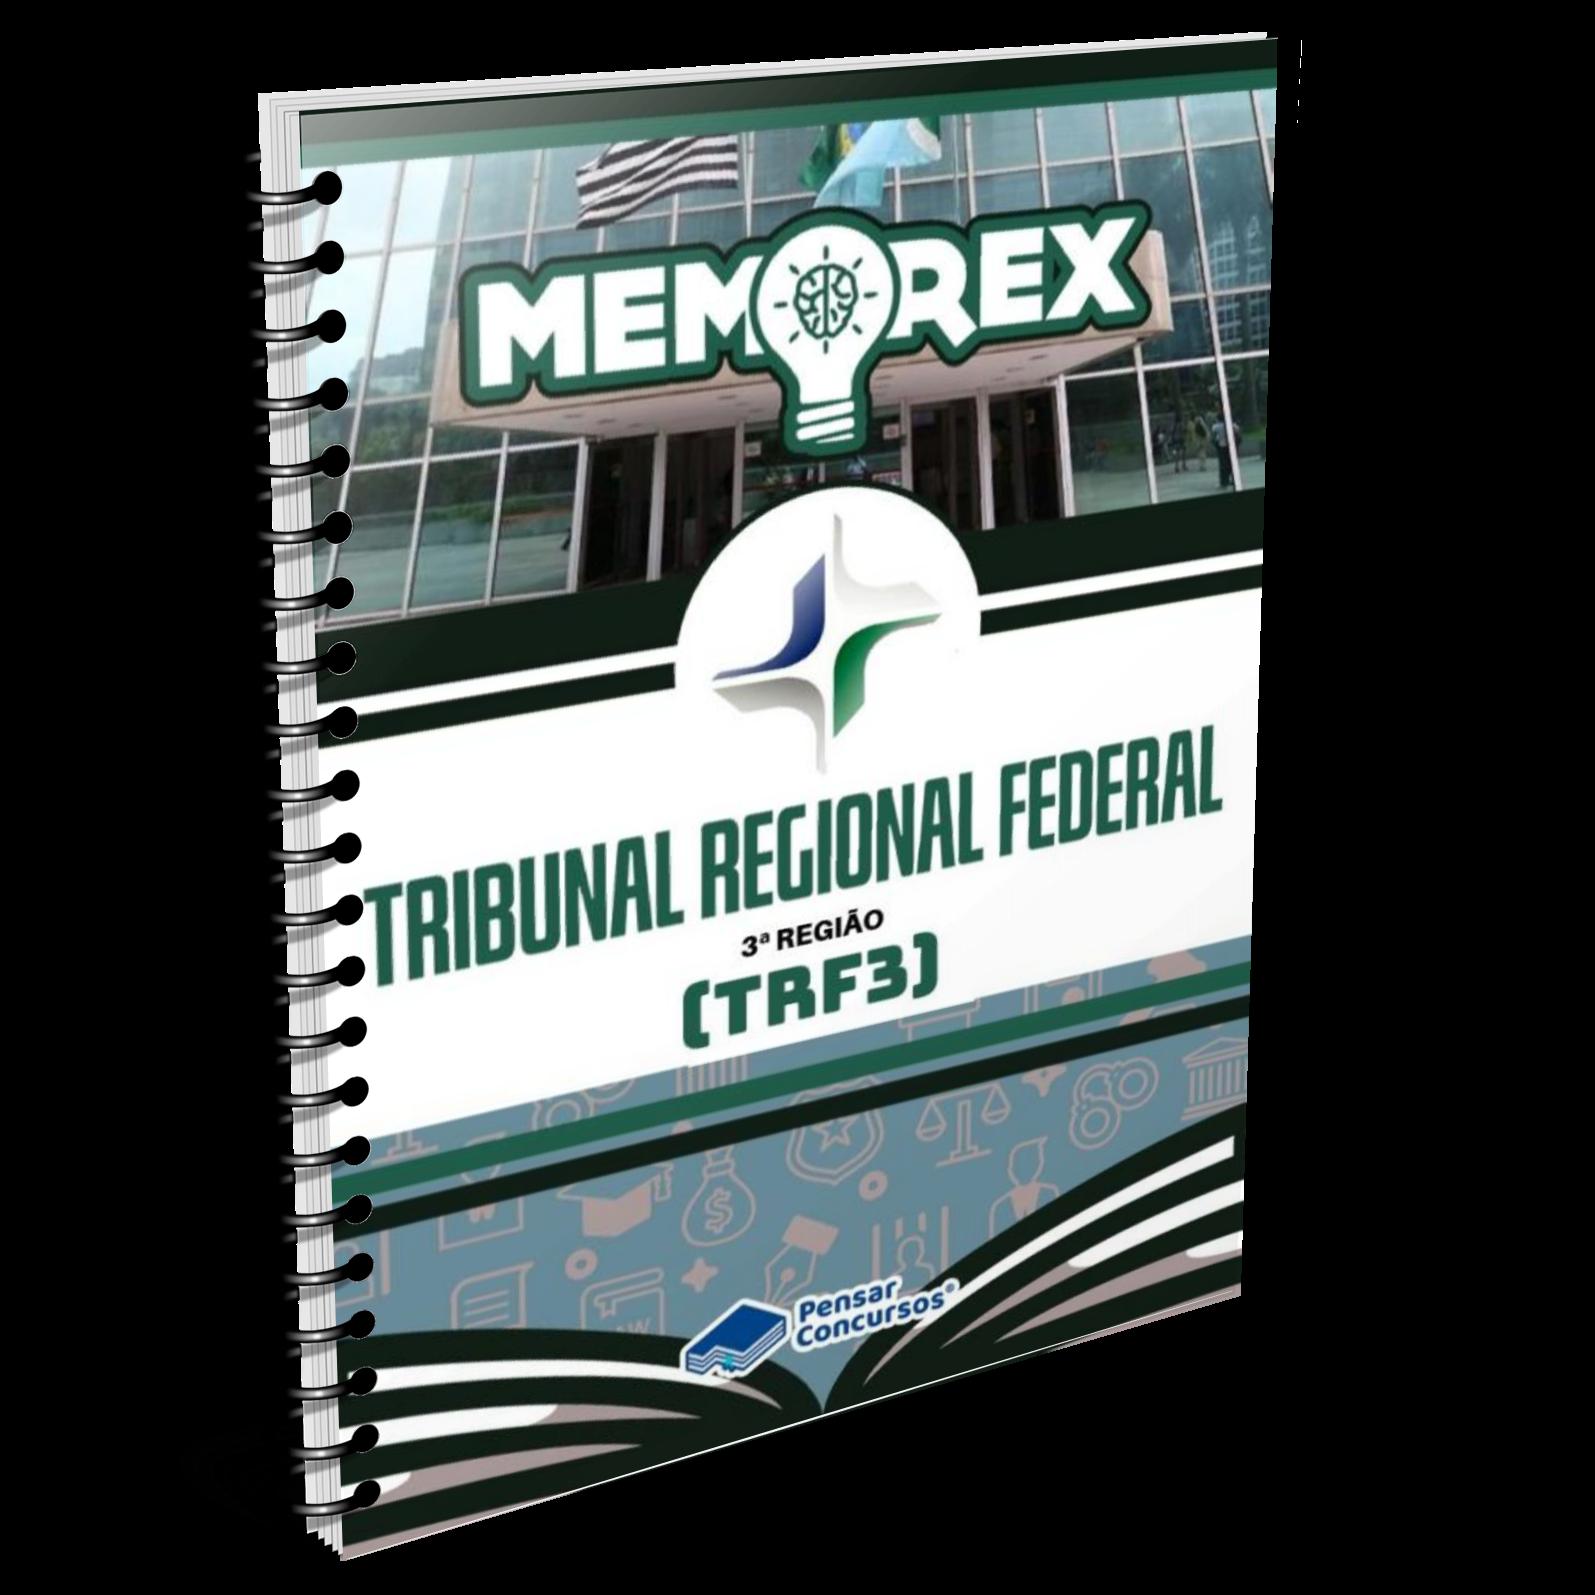 Memorex TRF 3